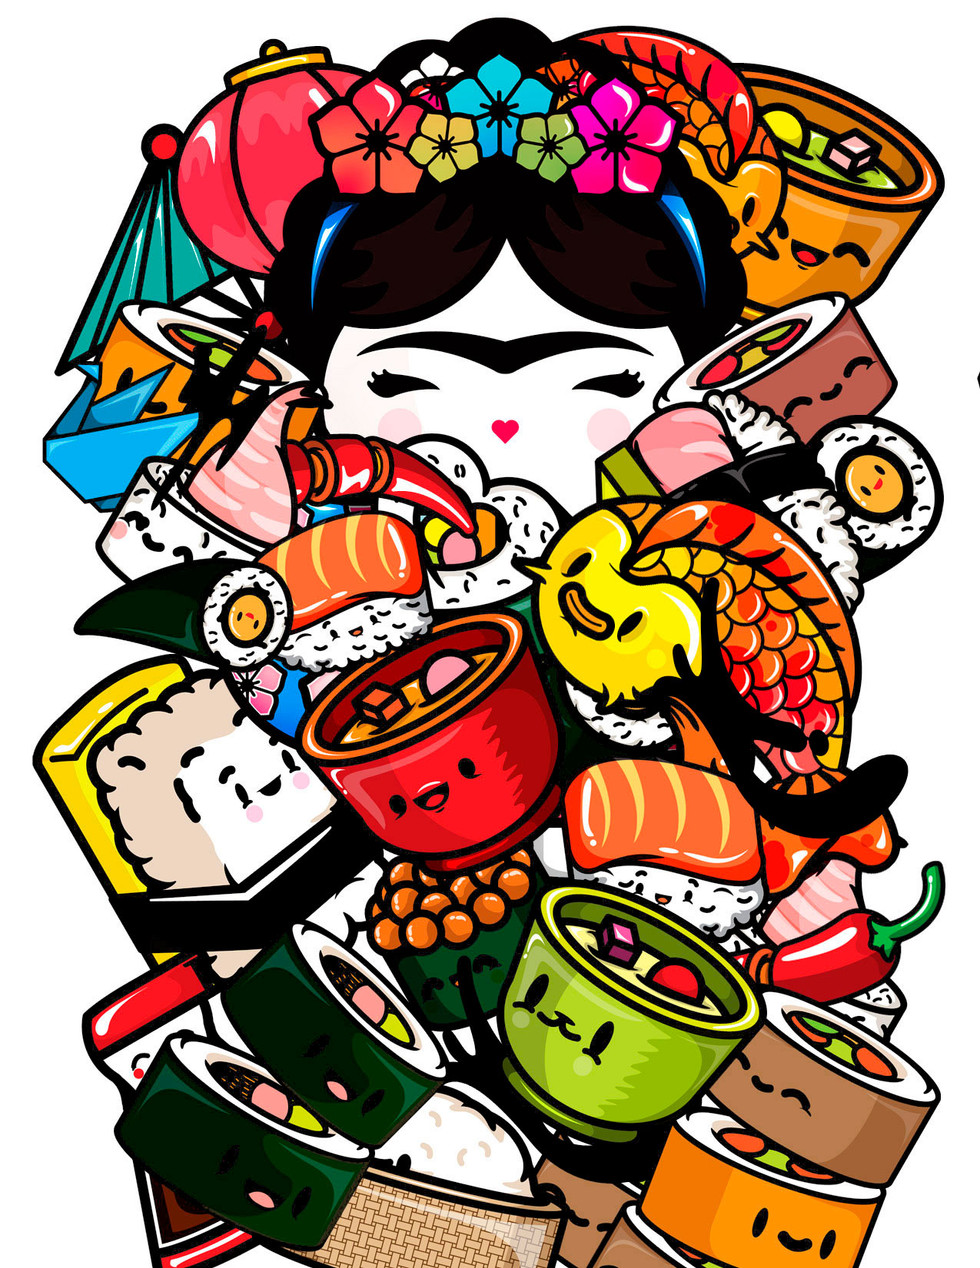 taka-sushi-mexico-chocotoy-4.jpg